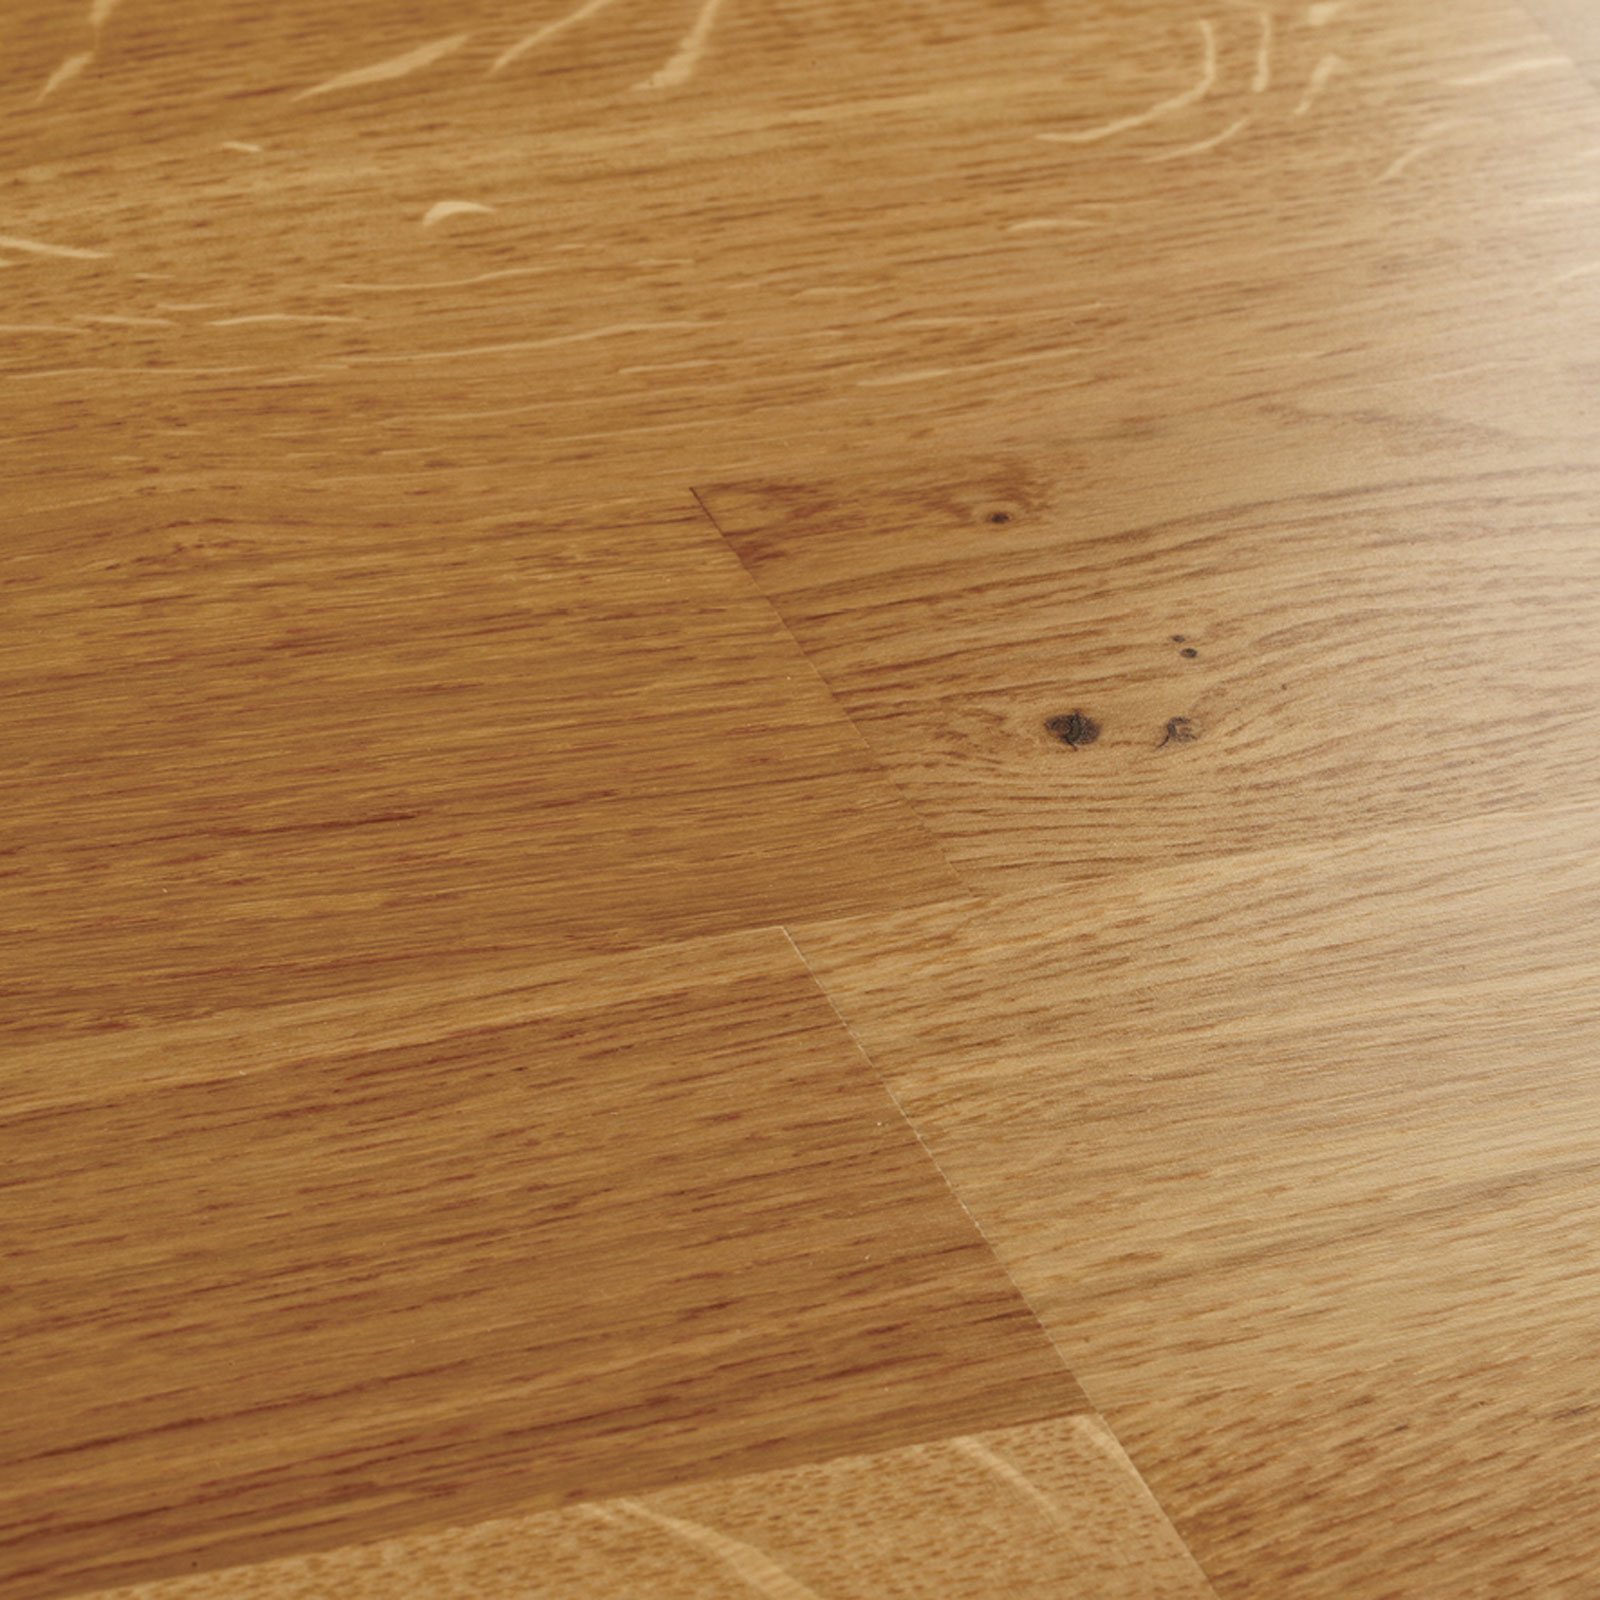 swatch-cropped-salcombe-natural-oak-3strip-1600.jpg